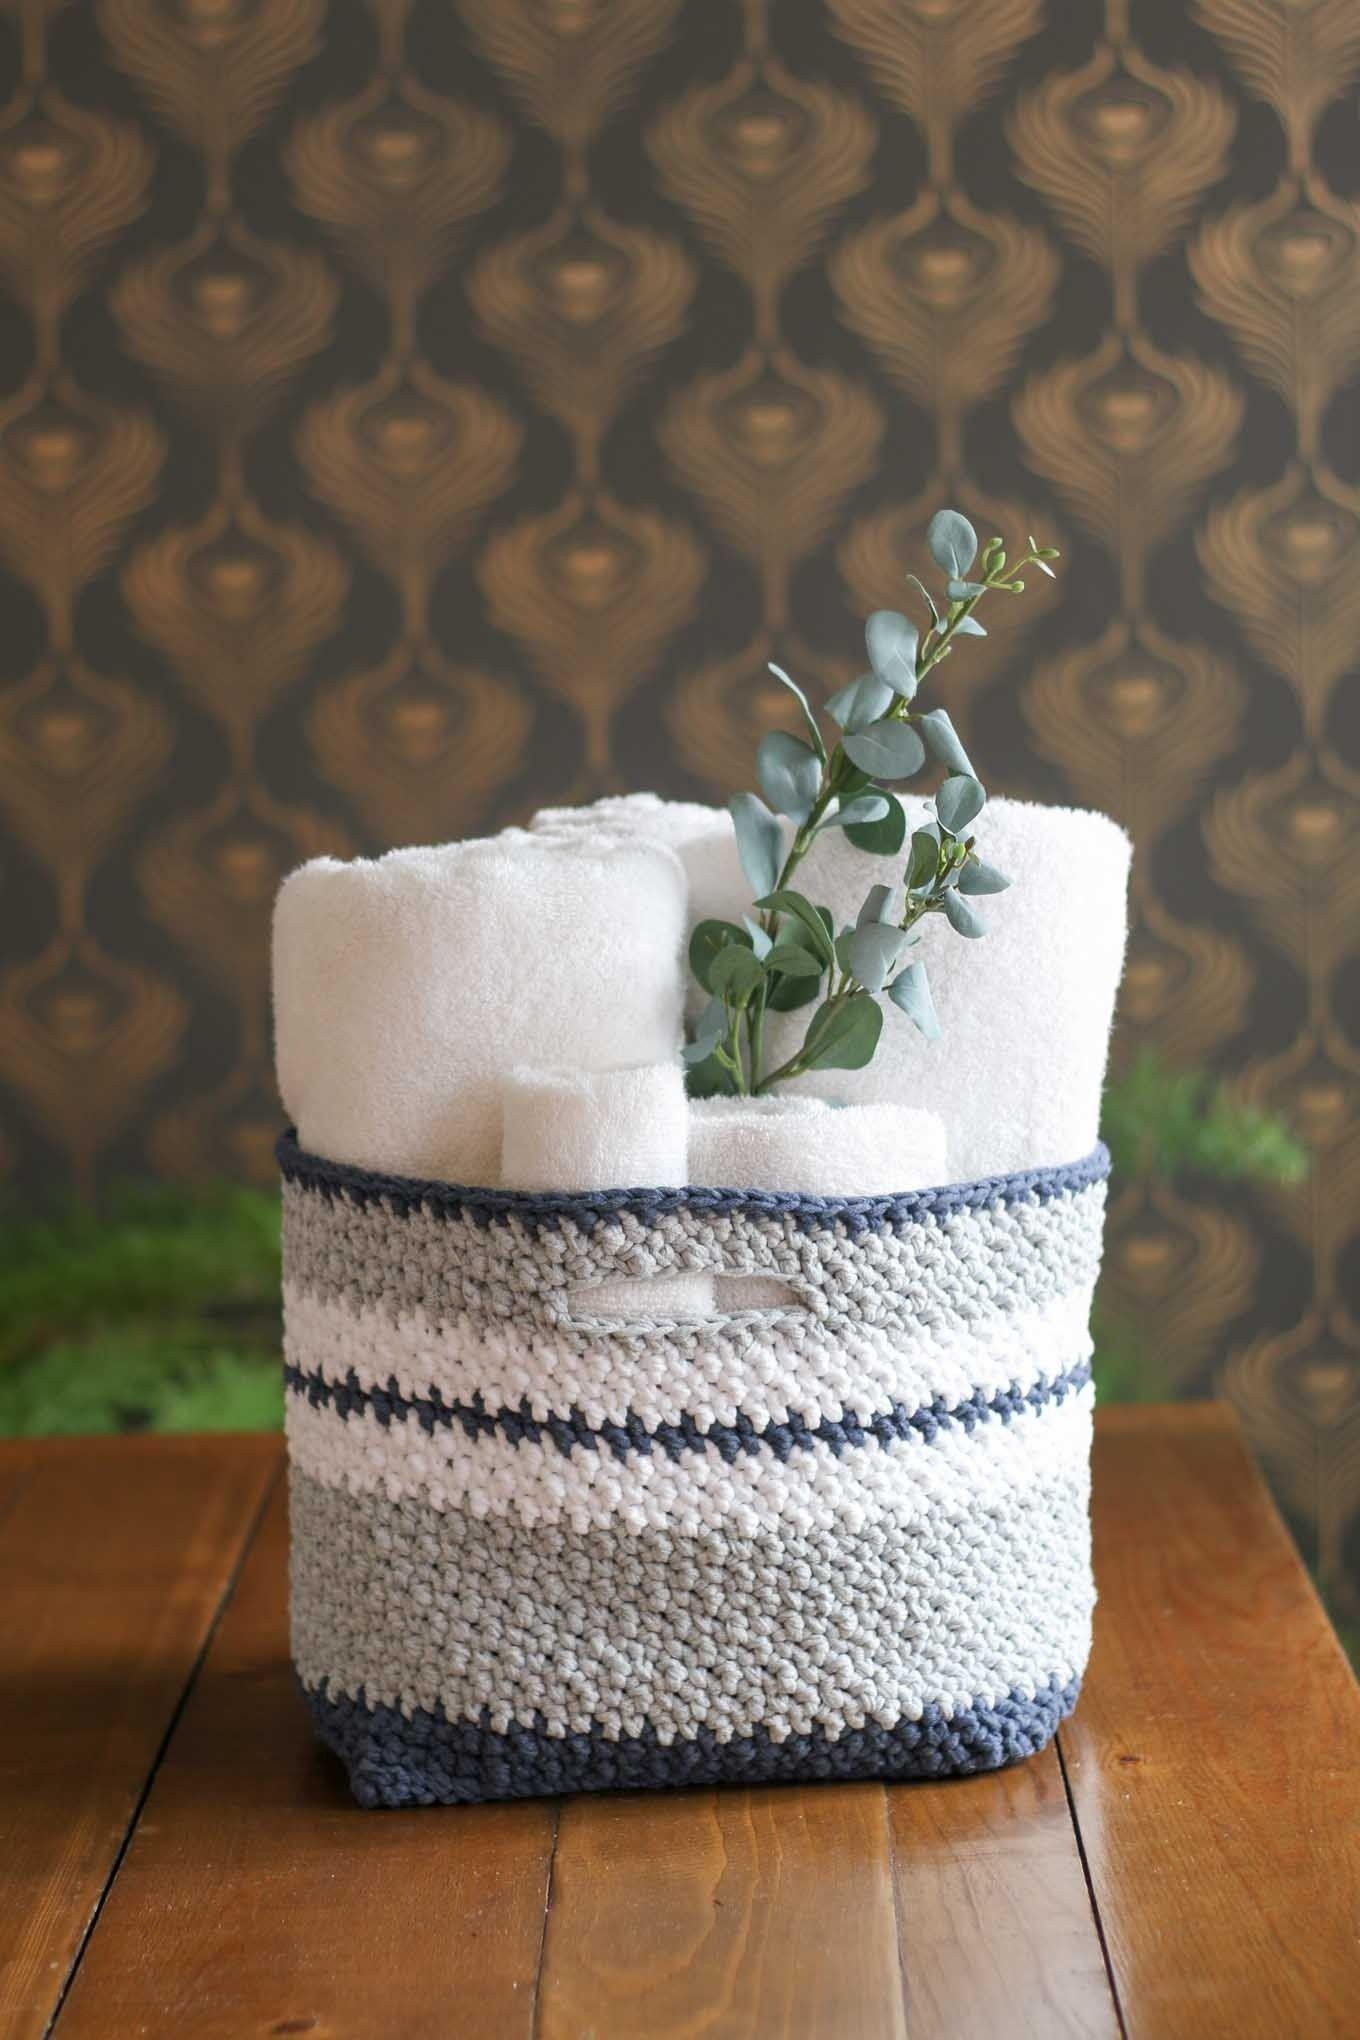 Crochet Kit - The Jacqueline Basket | Decoraciones del hogar, Varios ...